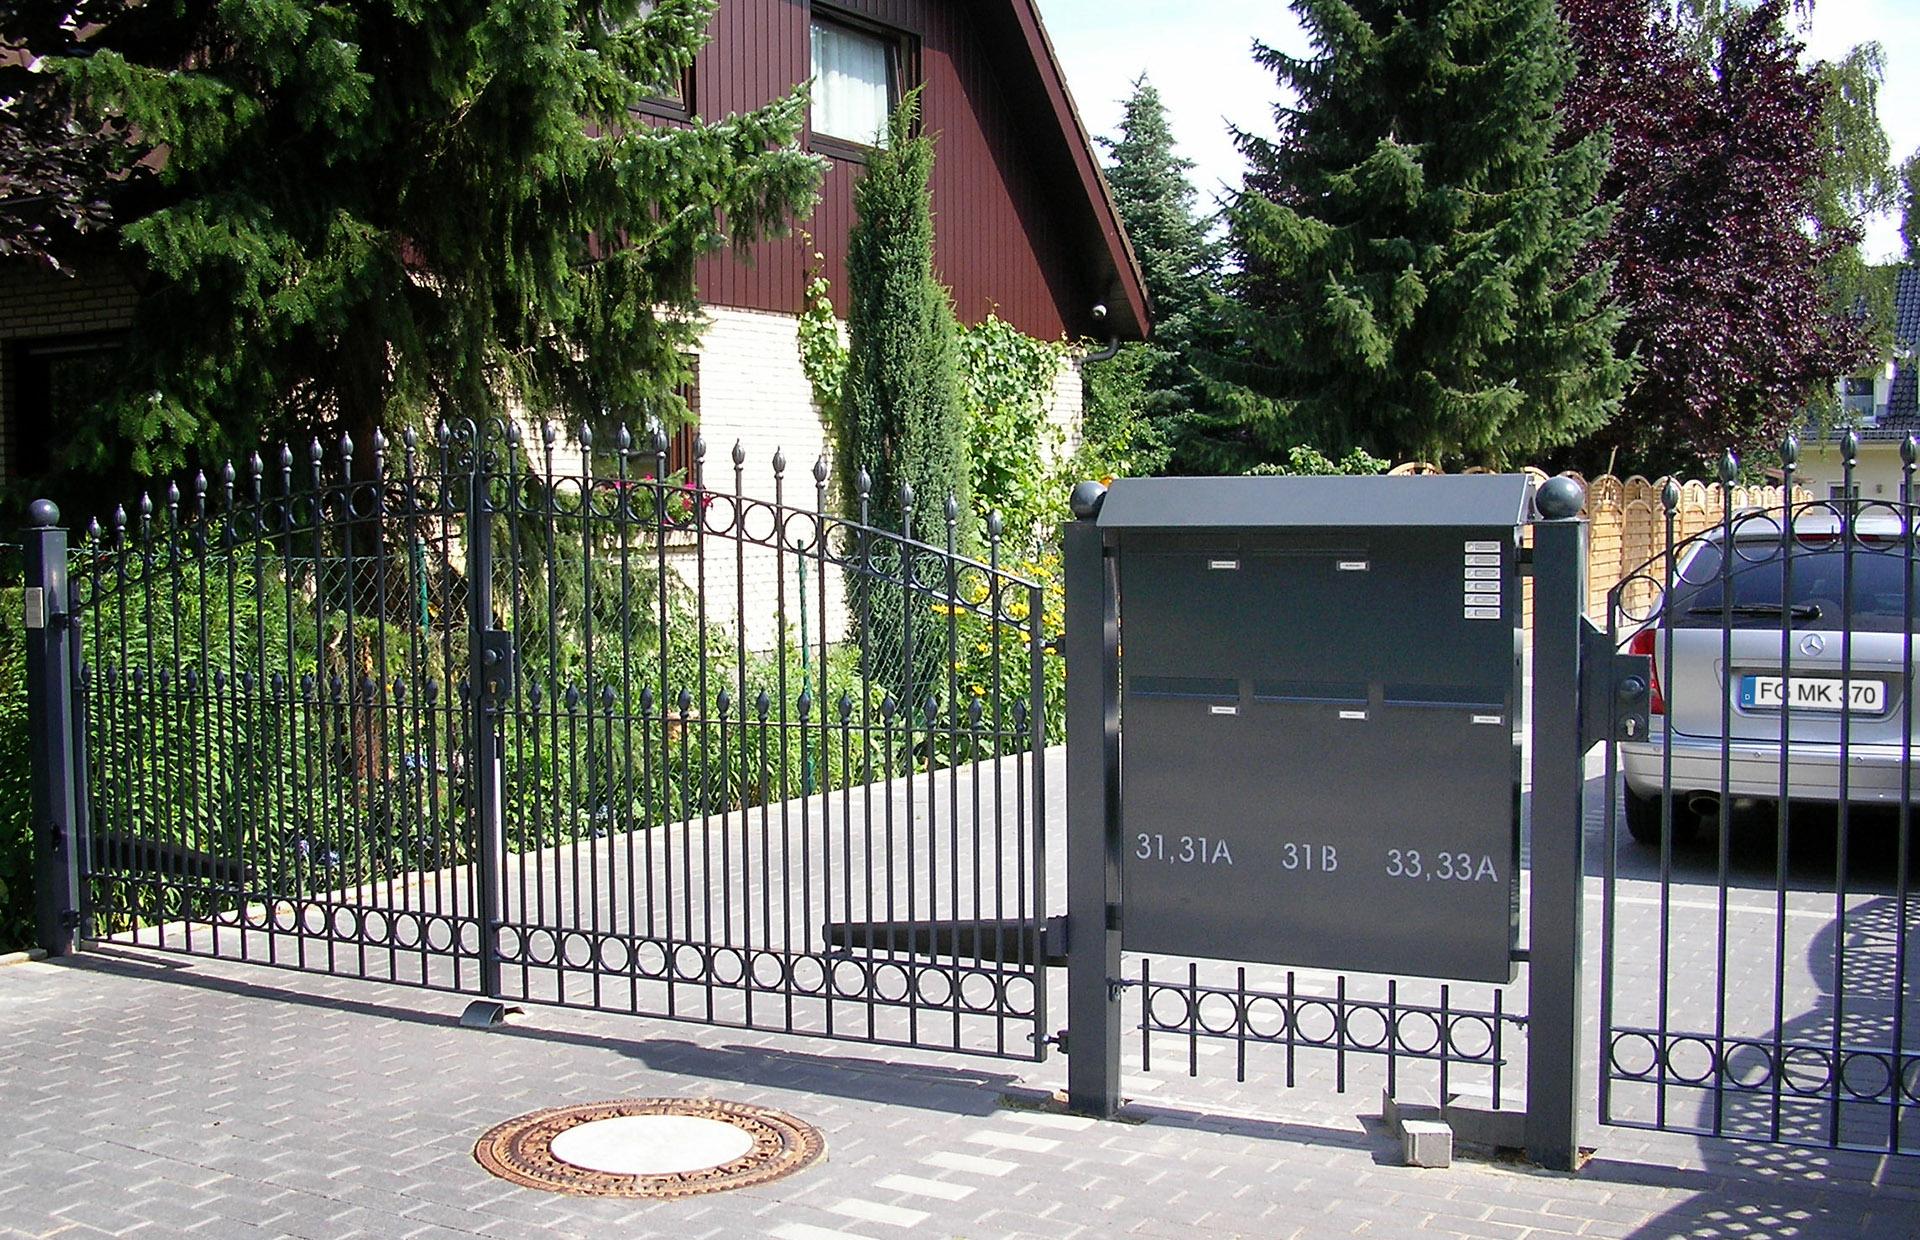 fresh fencemounted mailbox banks  max knobloch nachf gmbh